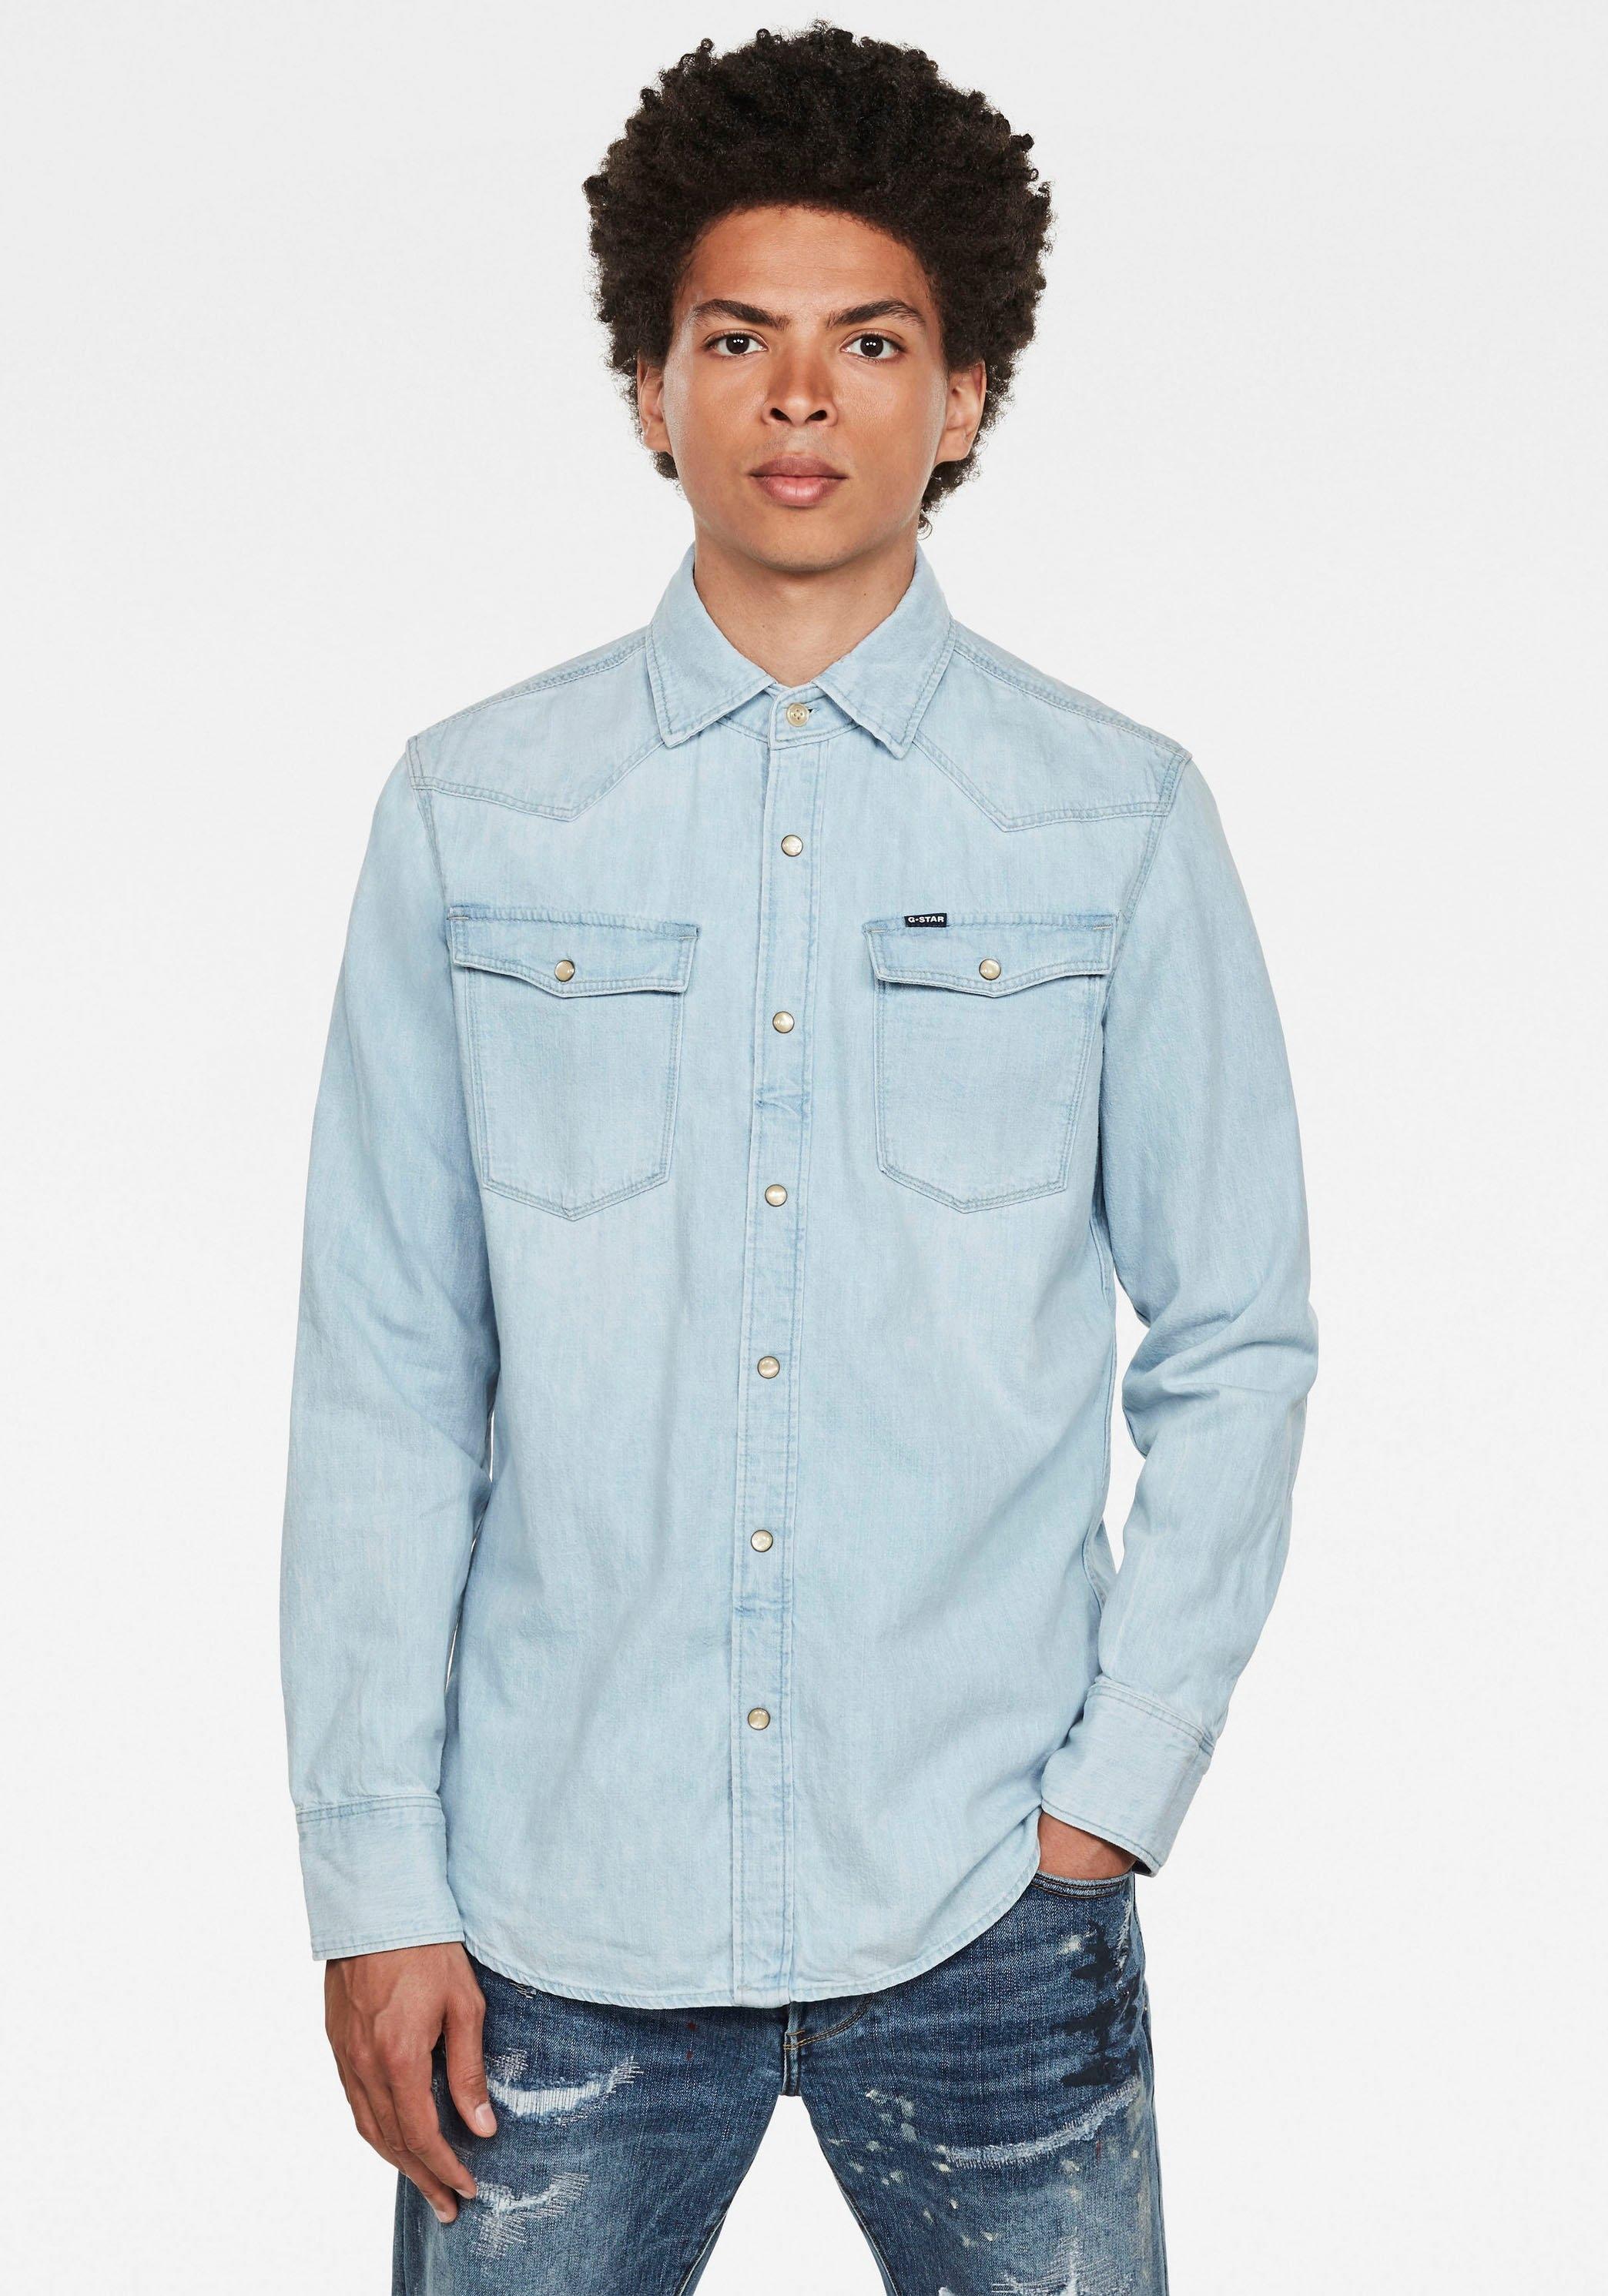 G-Star RAW jeansoverhemd Denim Slim Shirt goedkoop op otto.nl kopen